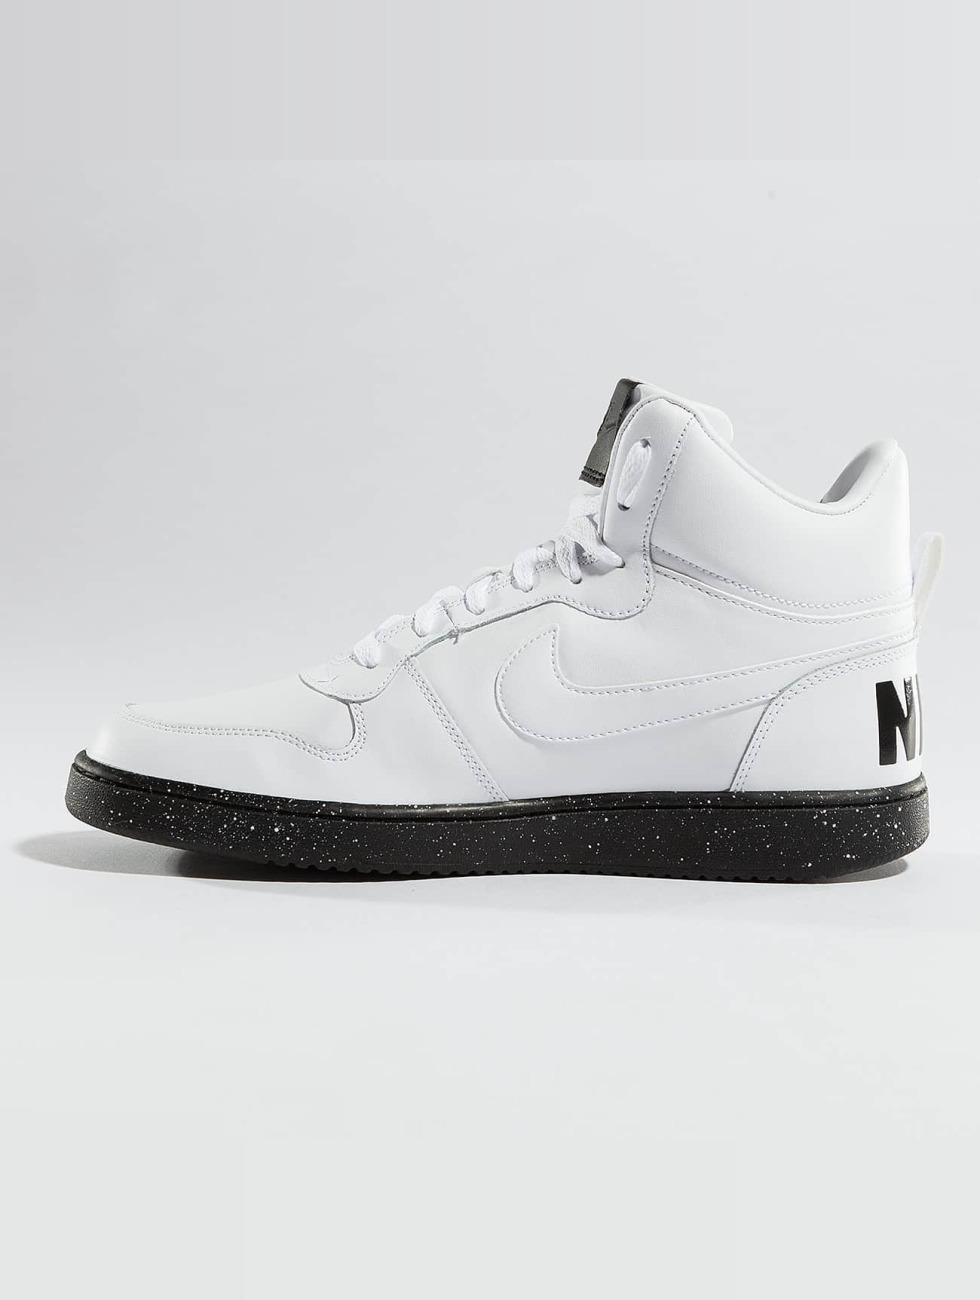 Metà Nike Schoen / Sneaker Corte Borgo In Ingegno 422.374 4kcKZuyb